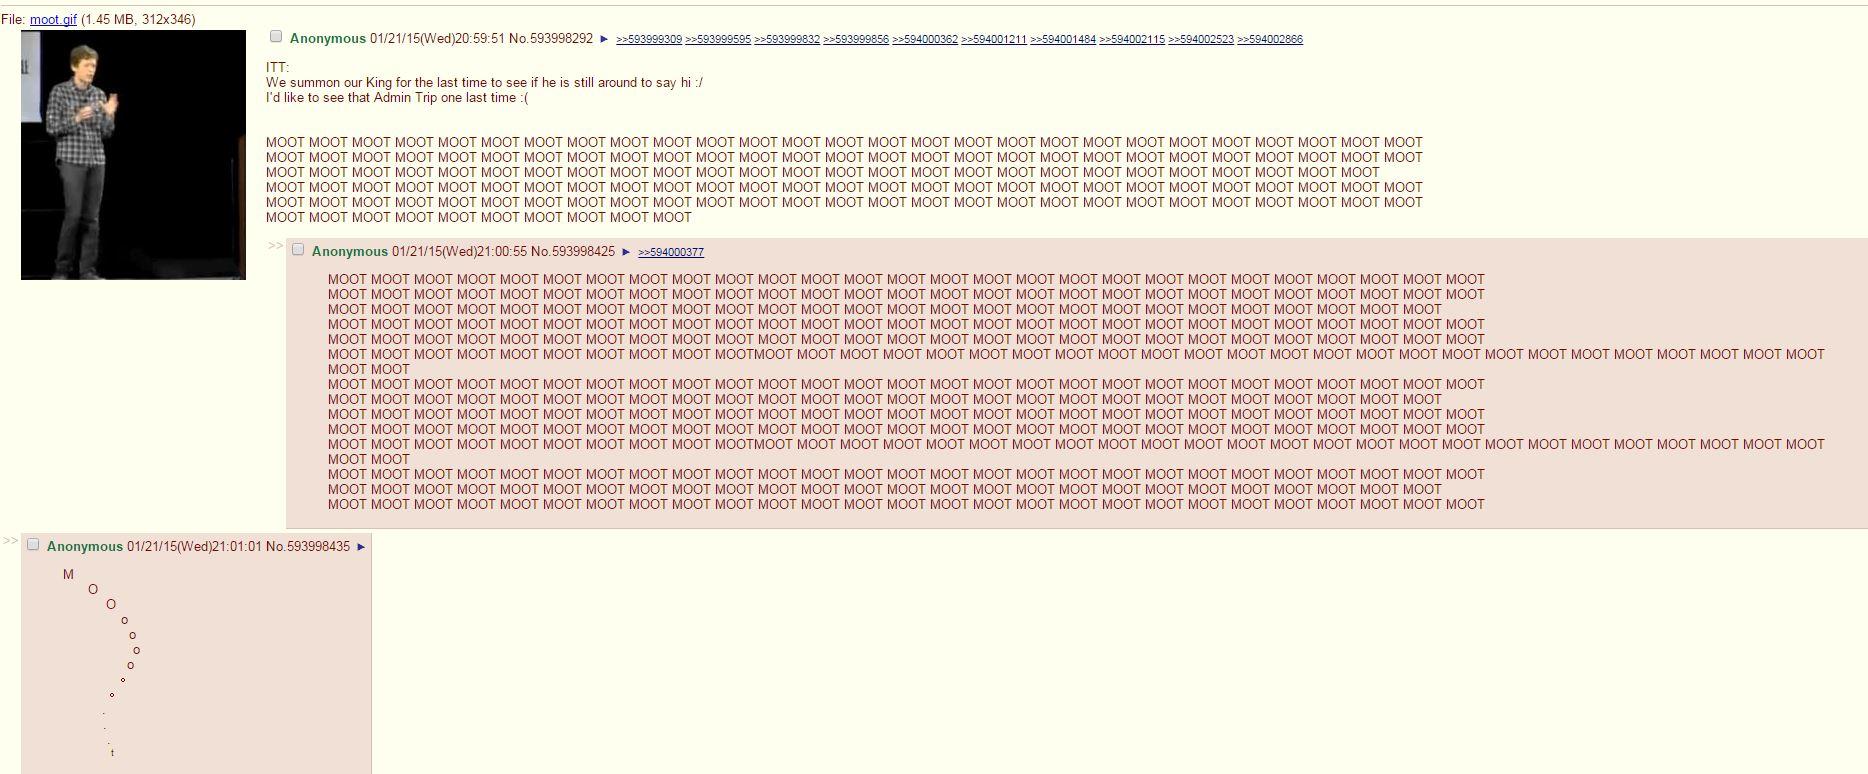 moot 4chan addio